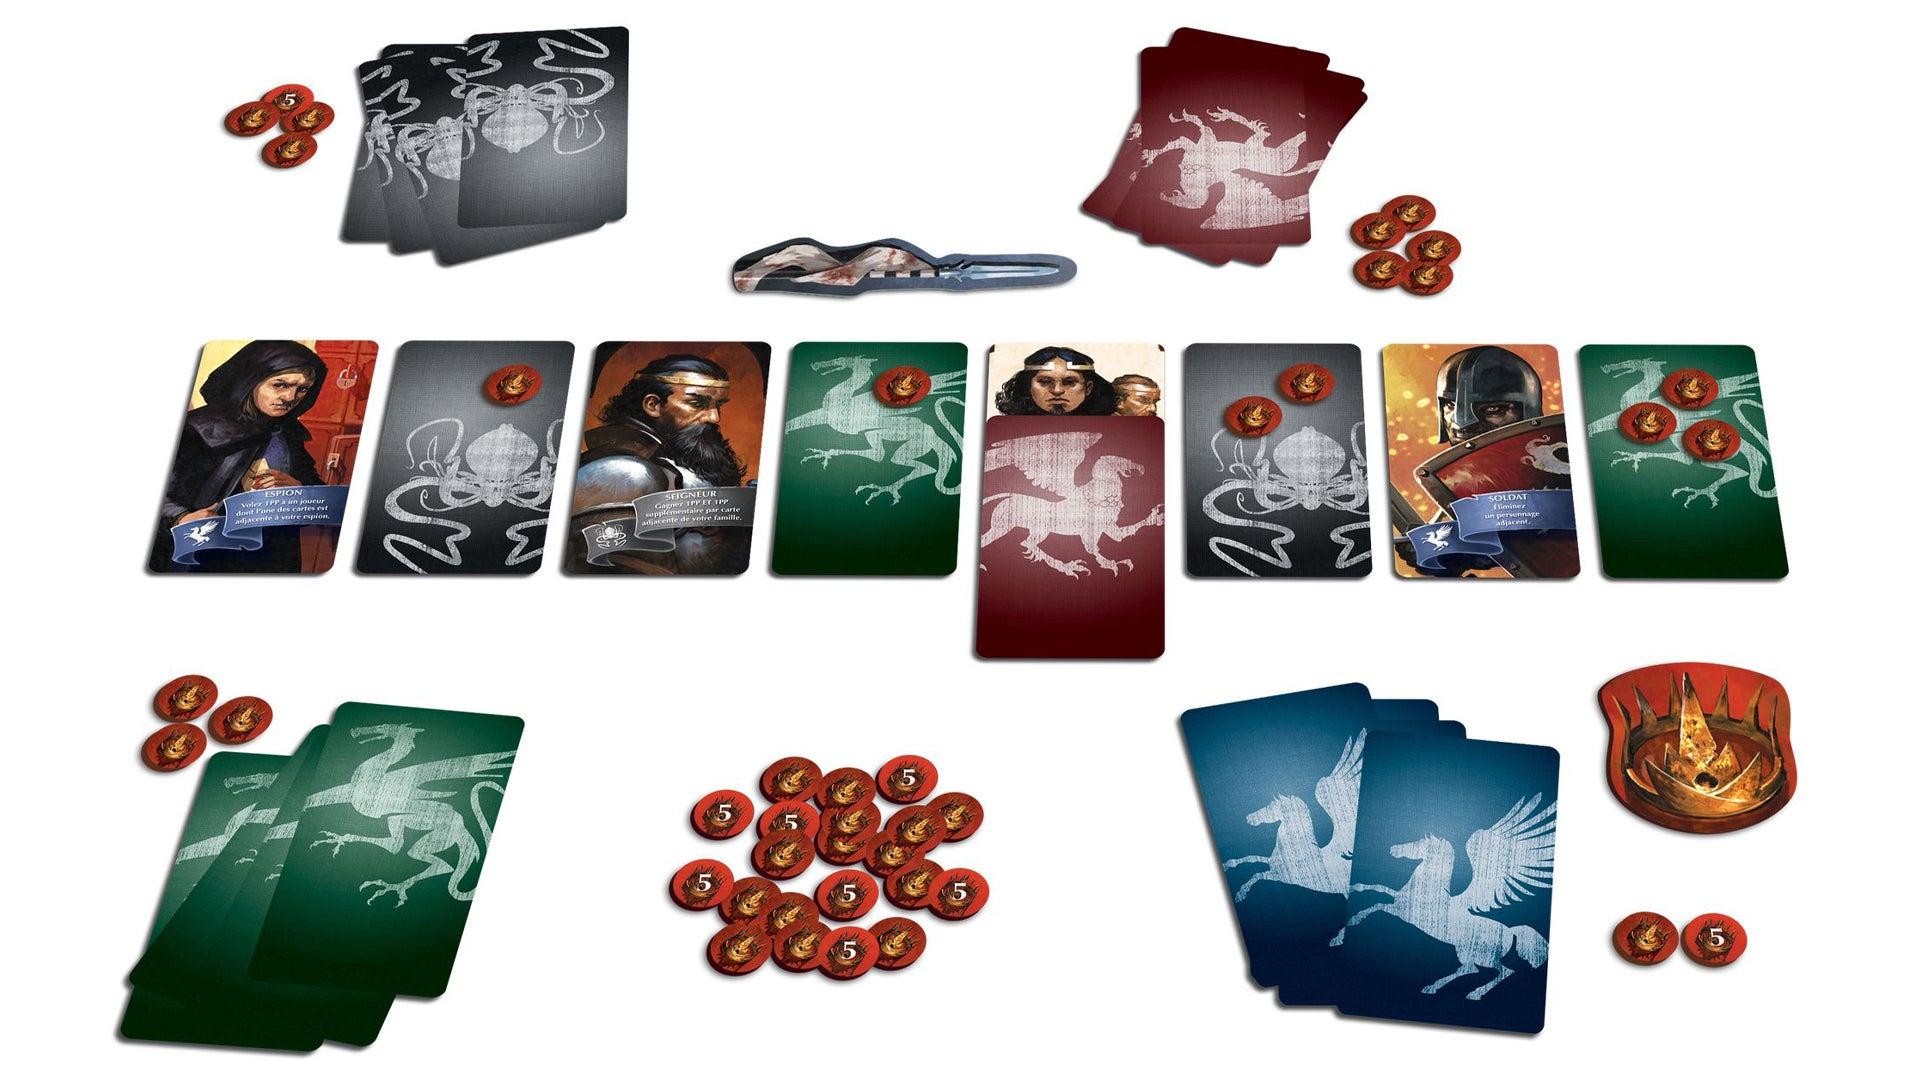 oriflamme-board-game-gameplay.jpg